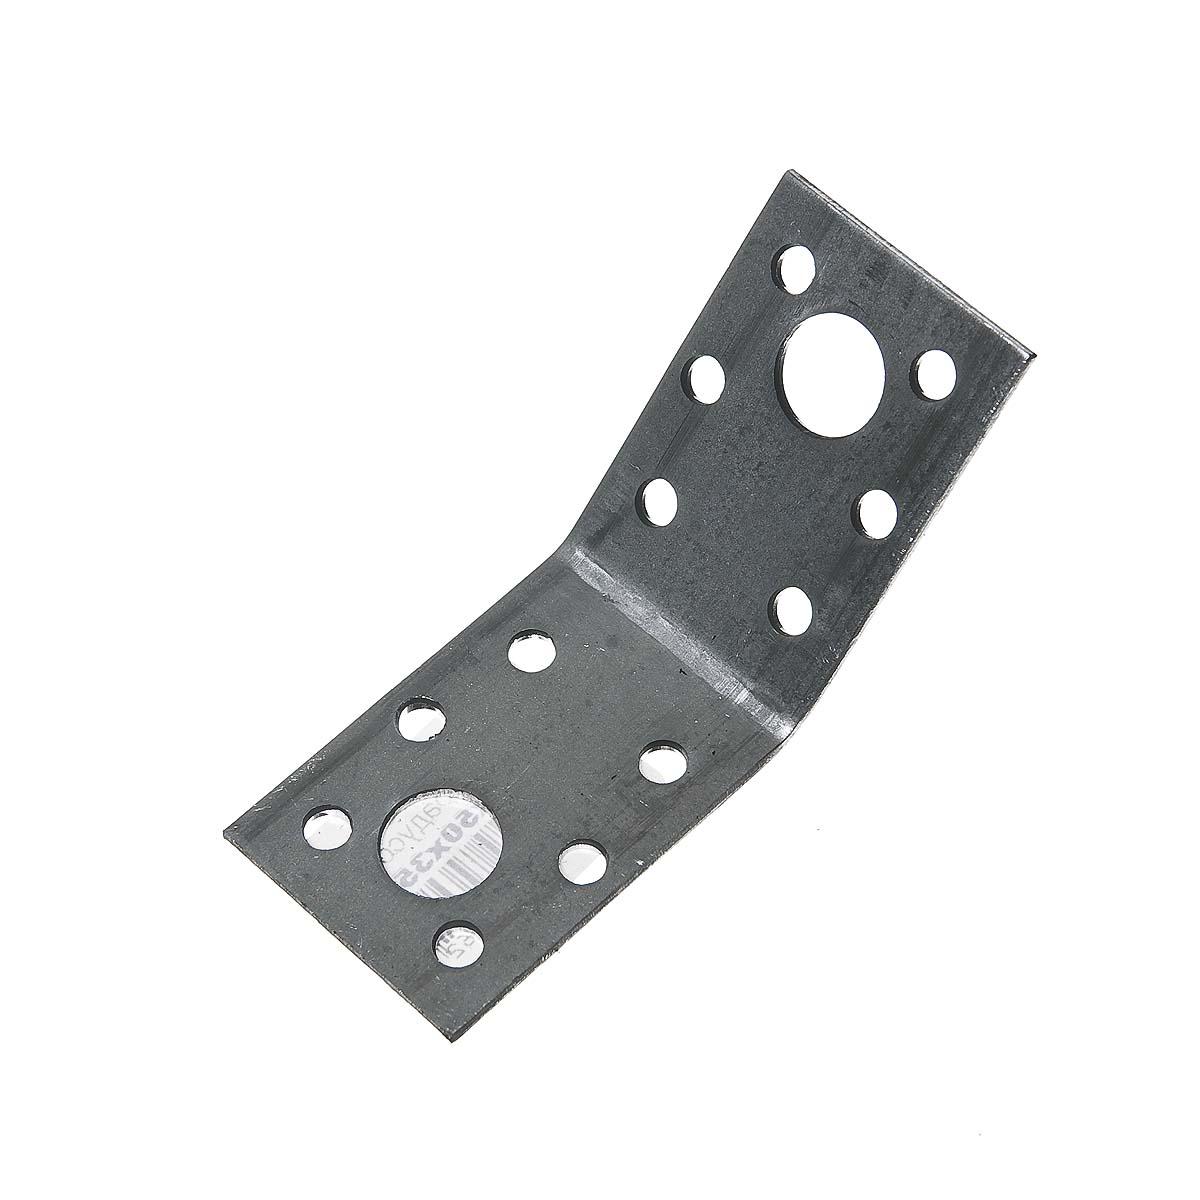 Уголок для стропильных соединений оцинкованный  50х50х35х2 мм 135°